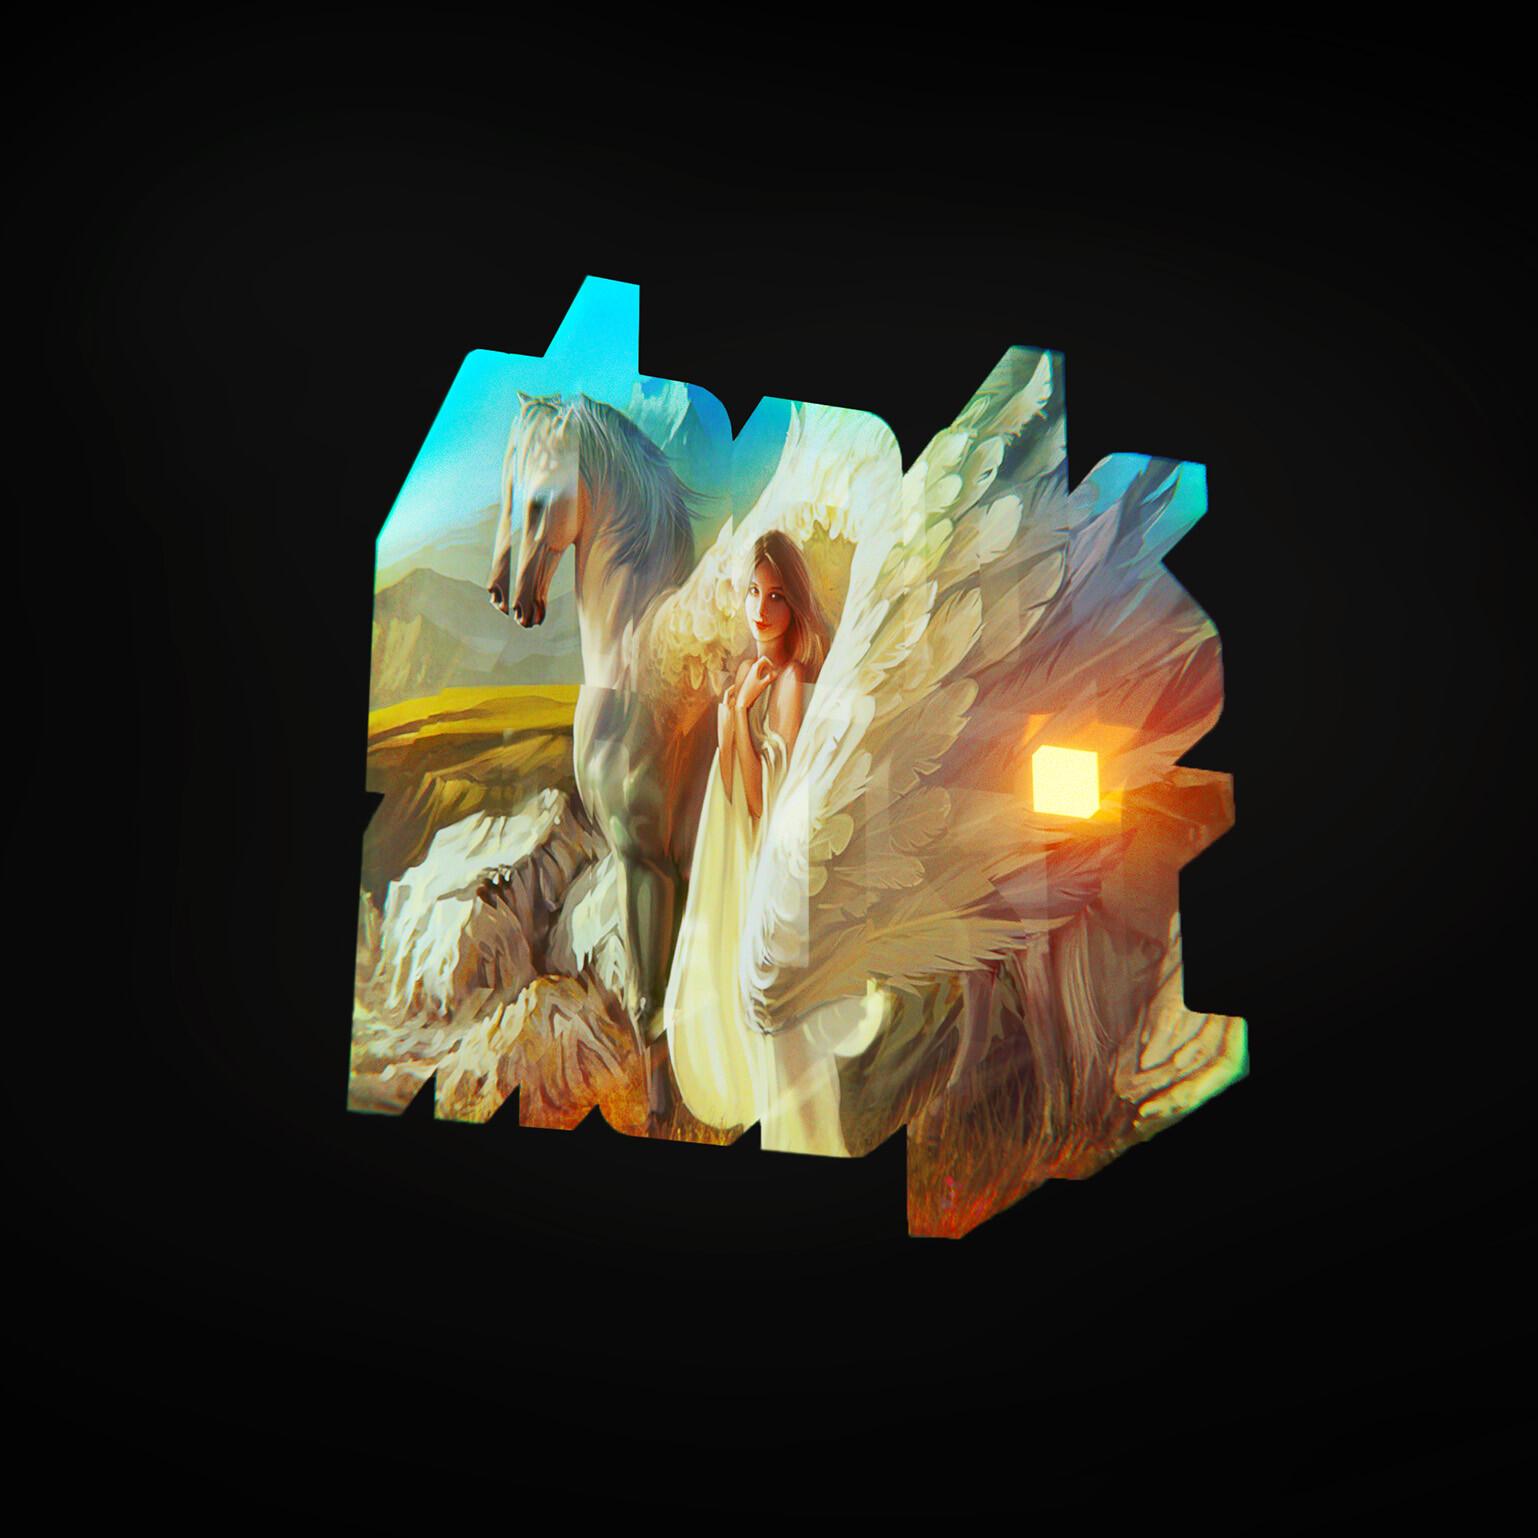 RHADS MUSIC - Trailer